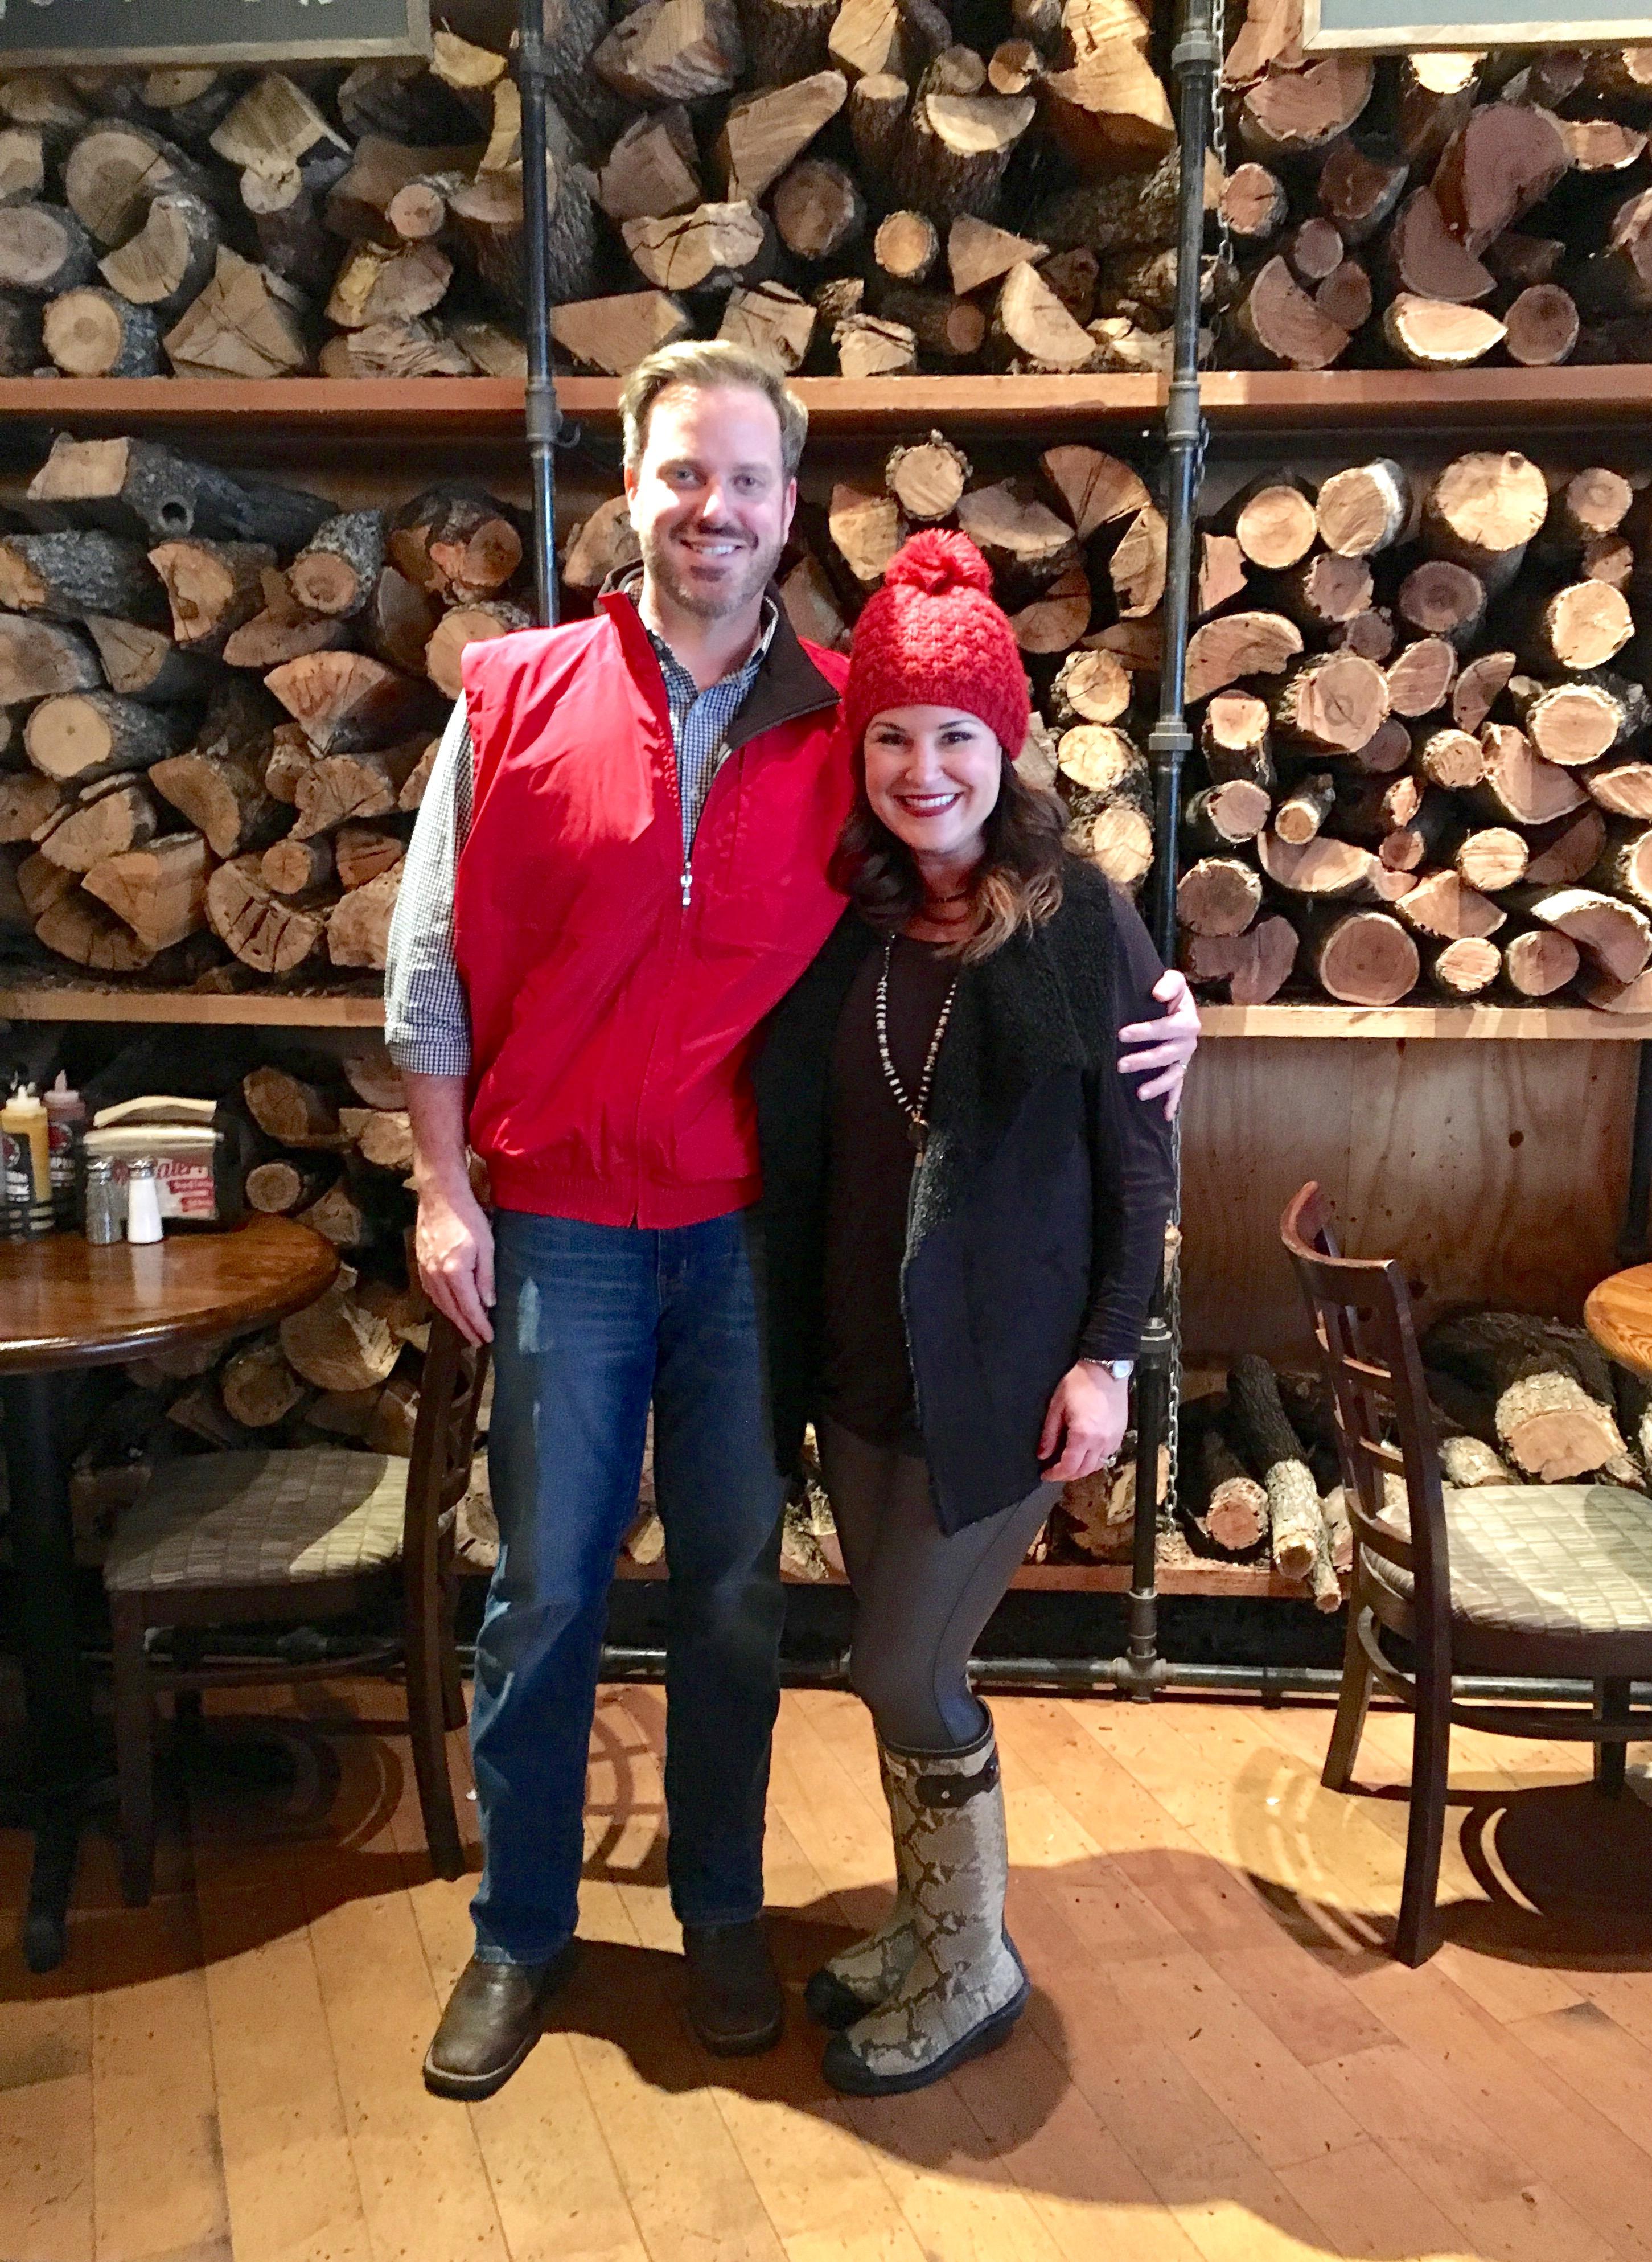 Kim and Fred Bishop at Twin Smokers BBQ in Atlanta Georgia before the Atlanta Falcons playoff game